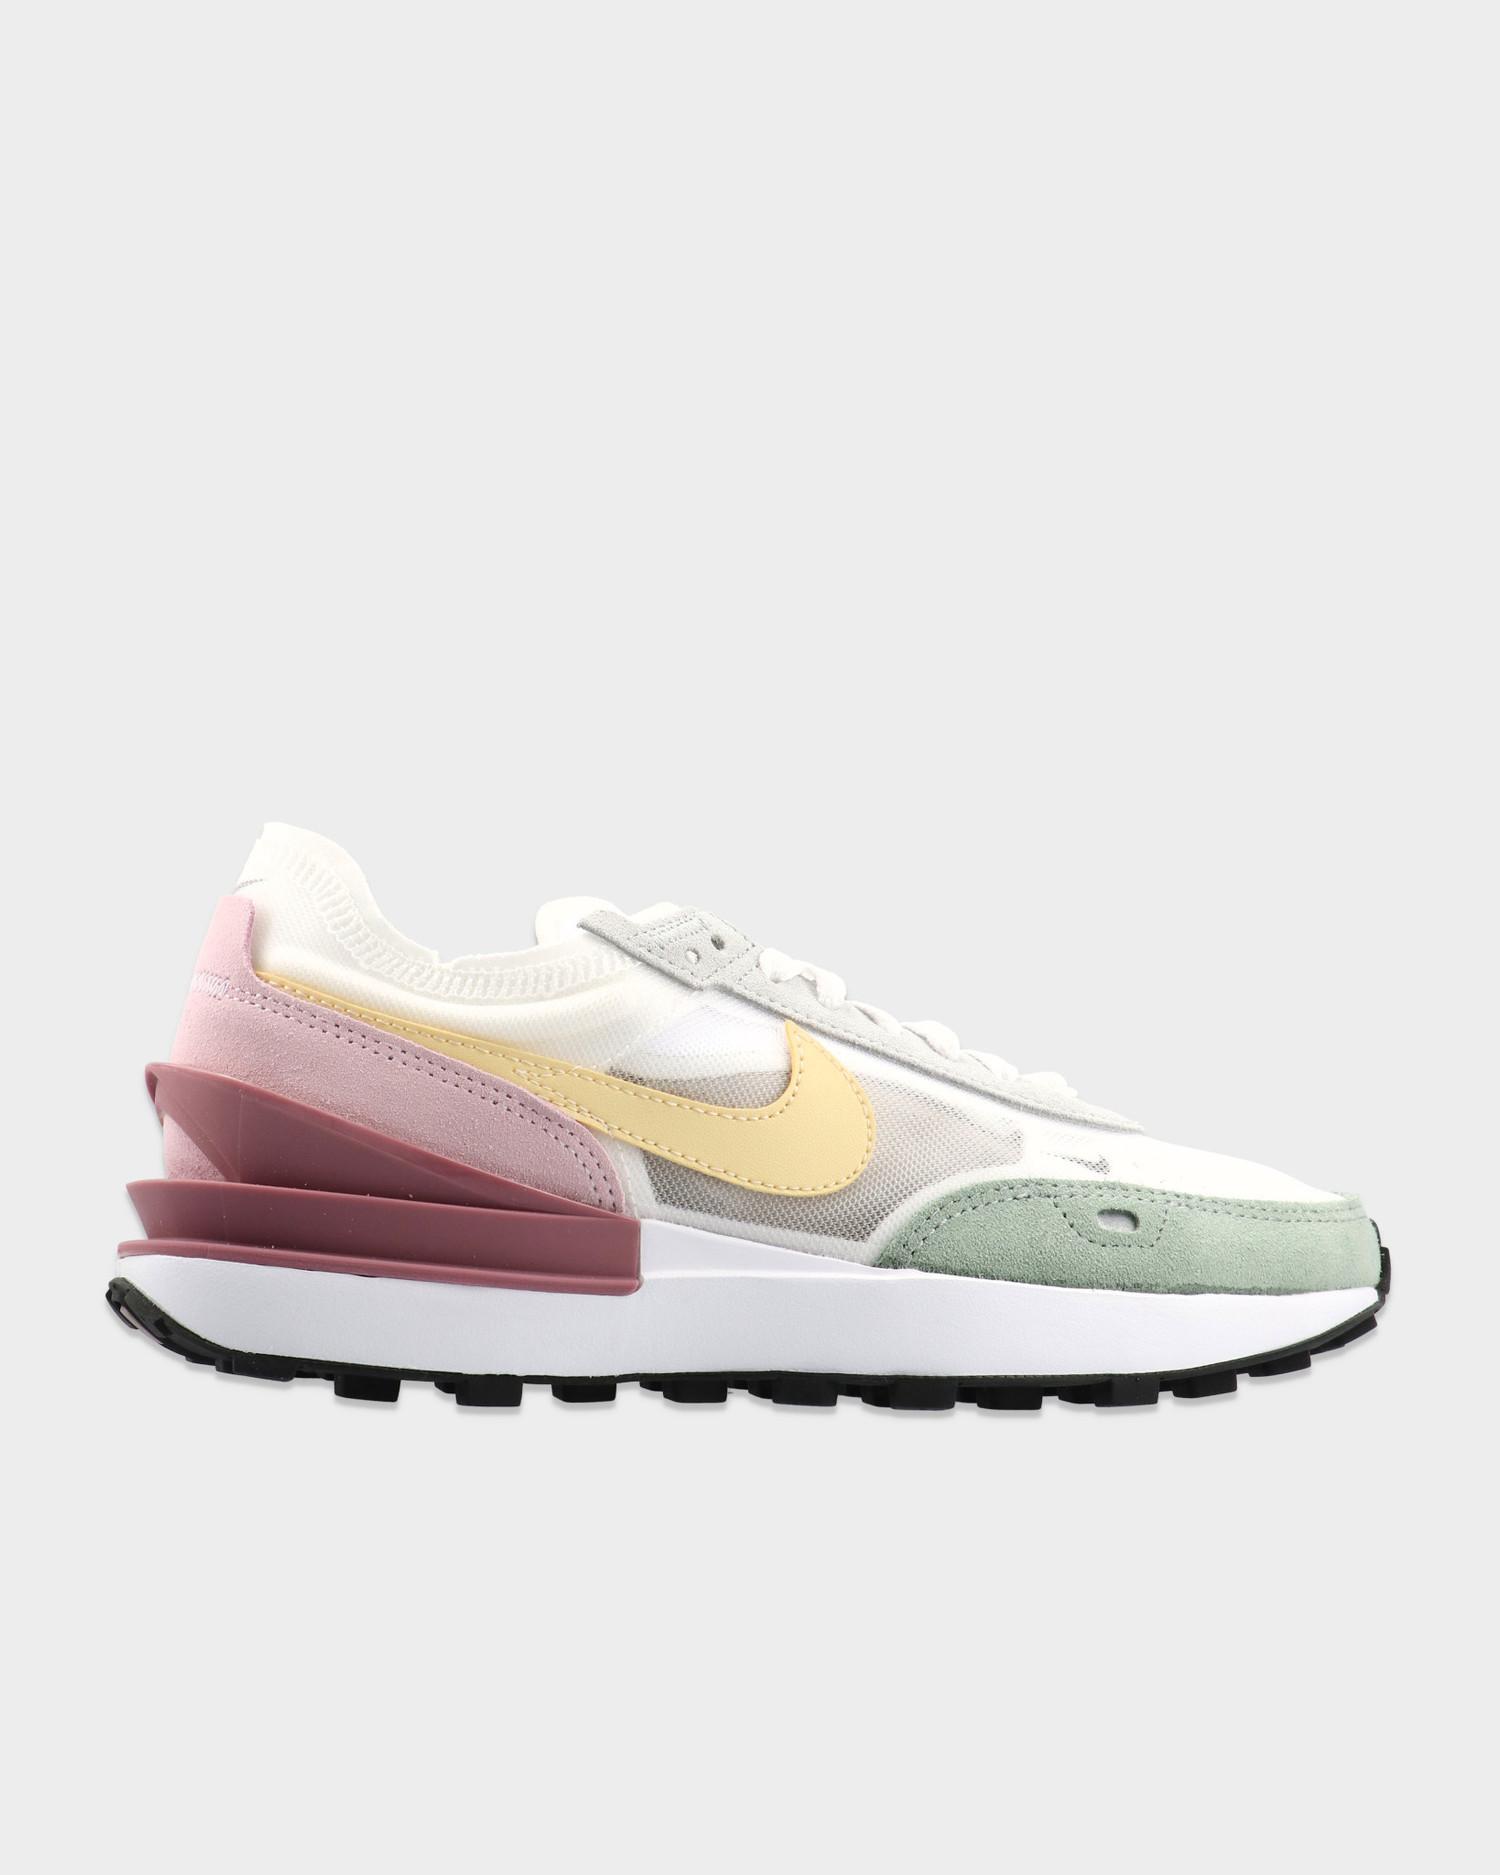 Nike Waffle One White/Lemon Drop/Regal Pink